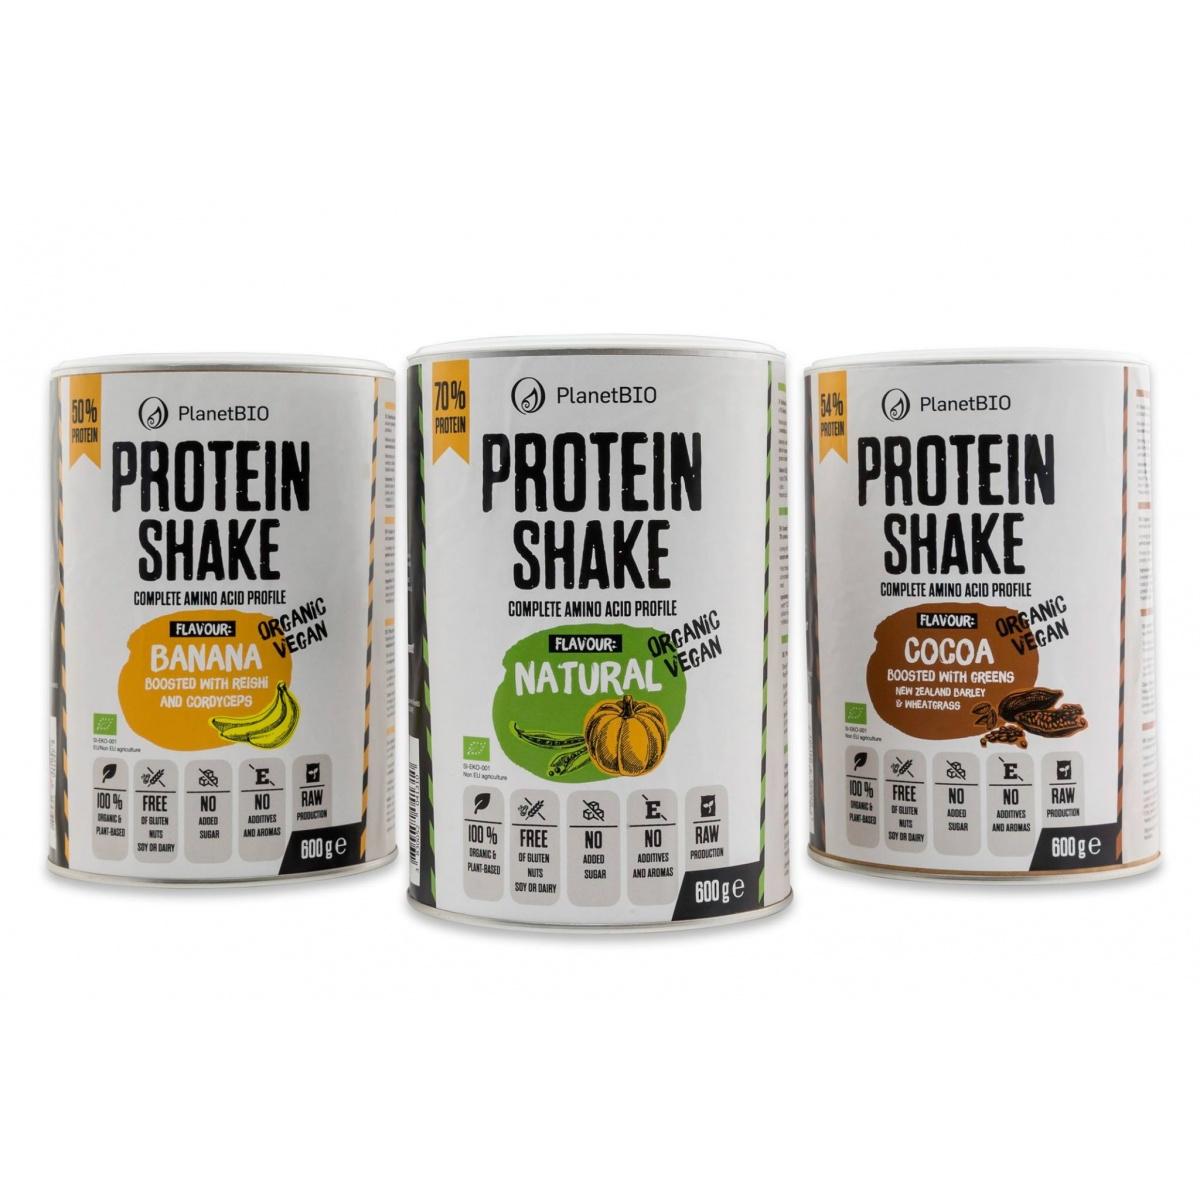 shake proteic vegan)